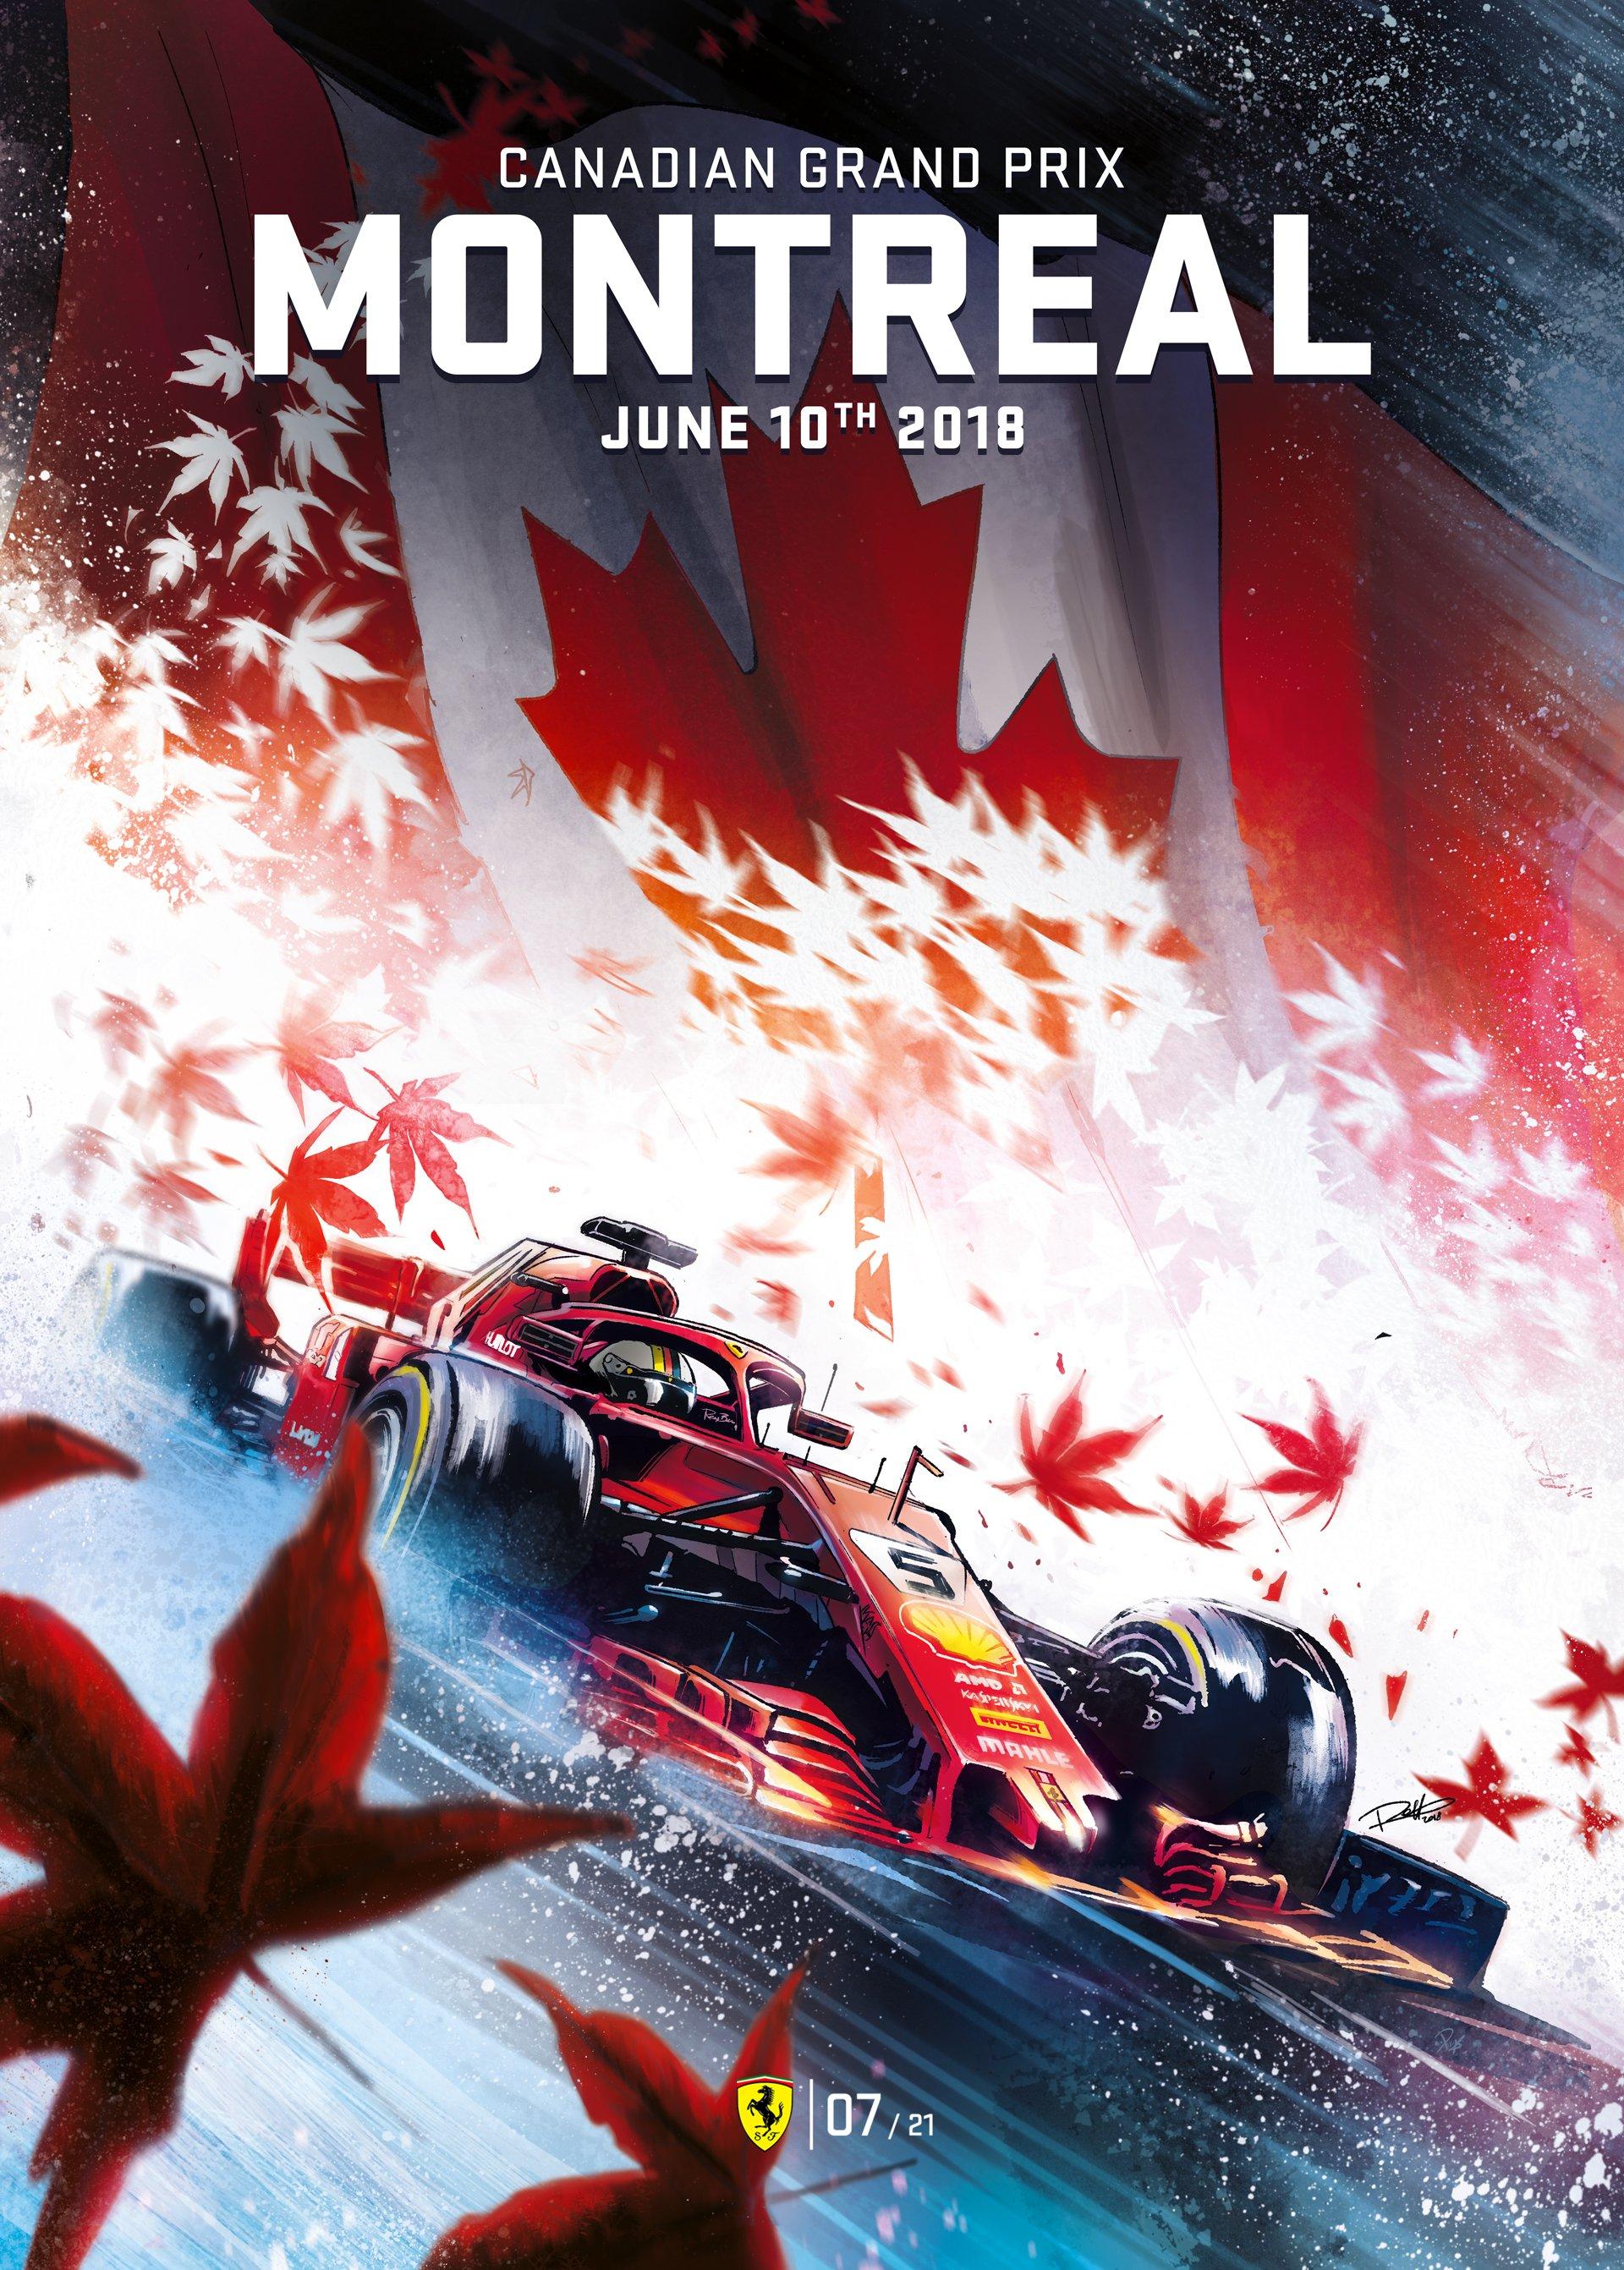 2018 Canadian Grand Prix